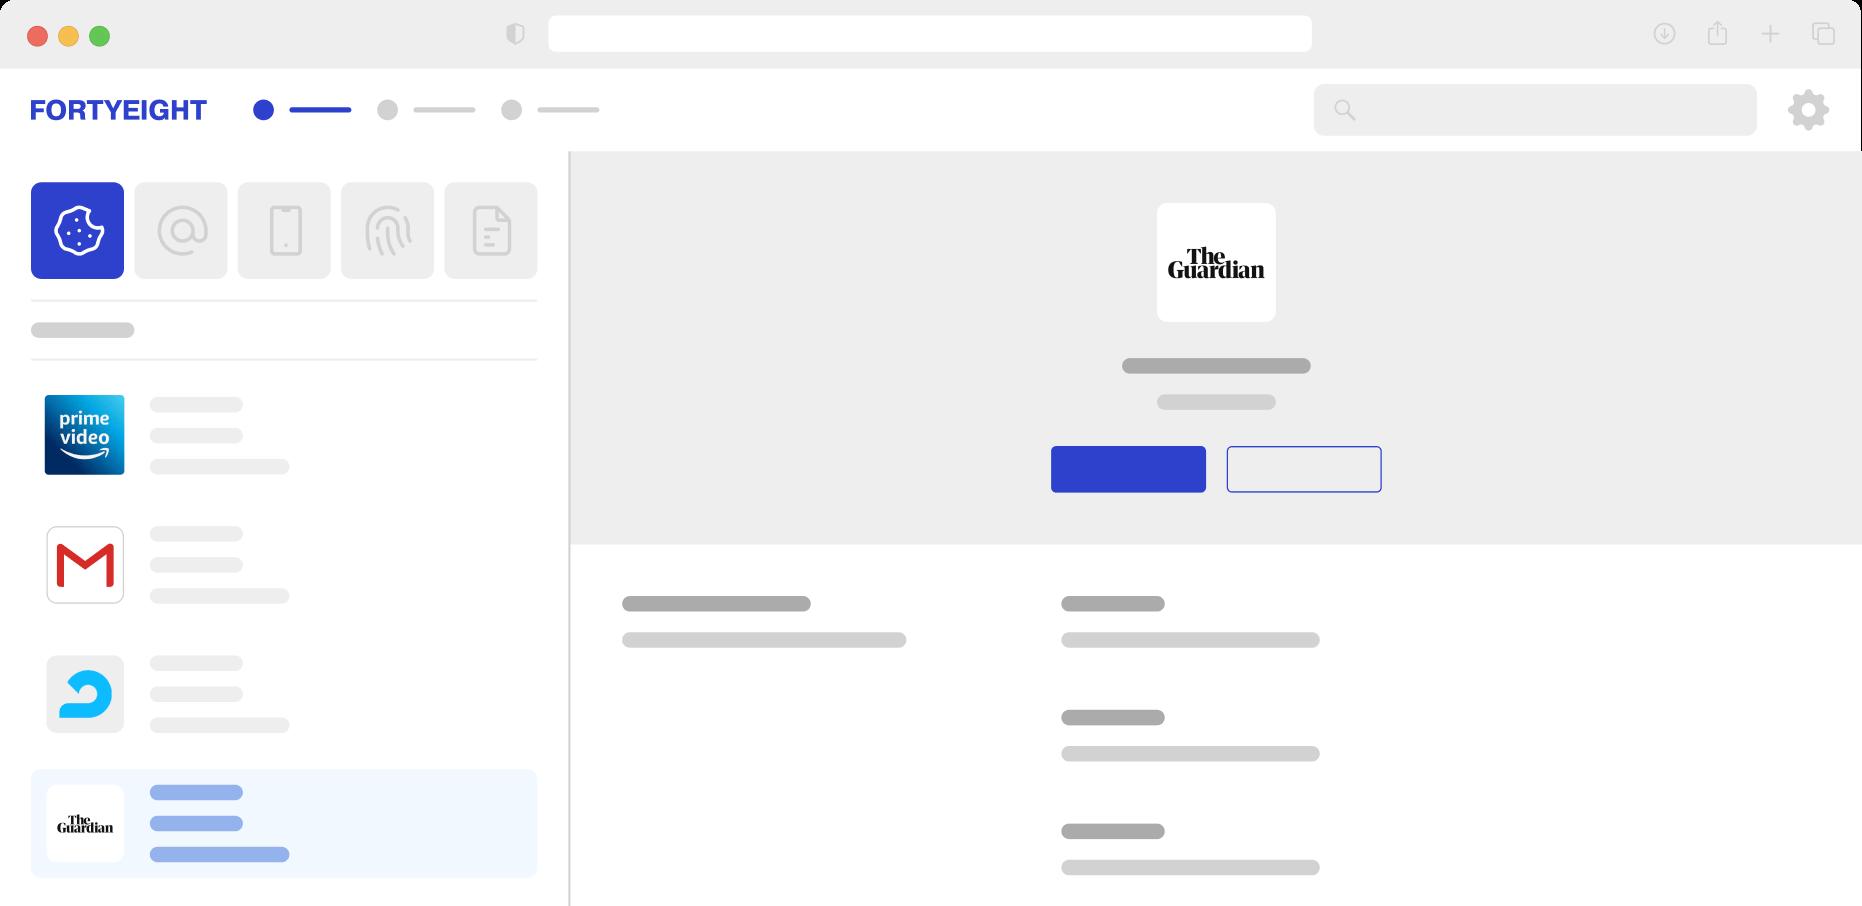 FORTYEIGHT web app on desktop